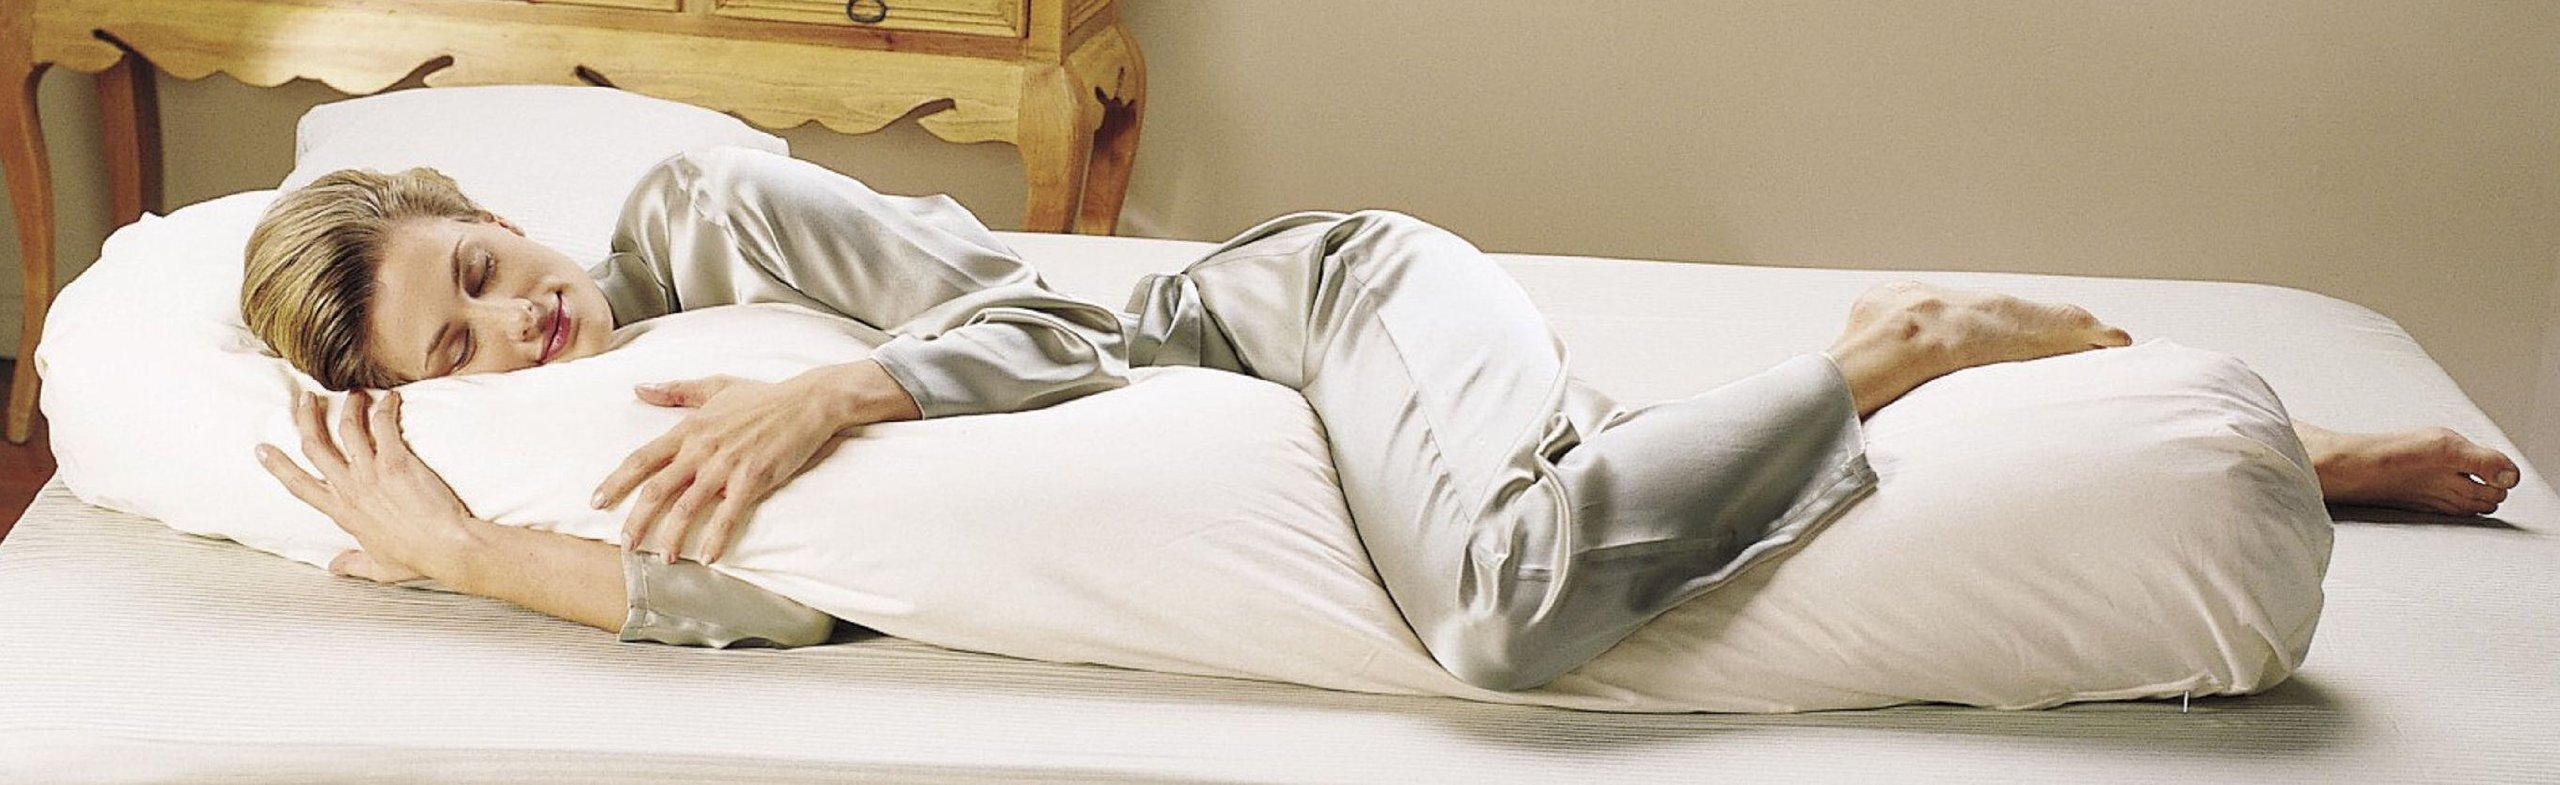 Teen Bean Body Pillow Staph Chek Shell, Hypoallergenic Fill and Pillowcase